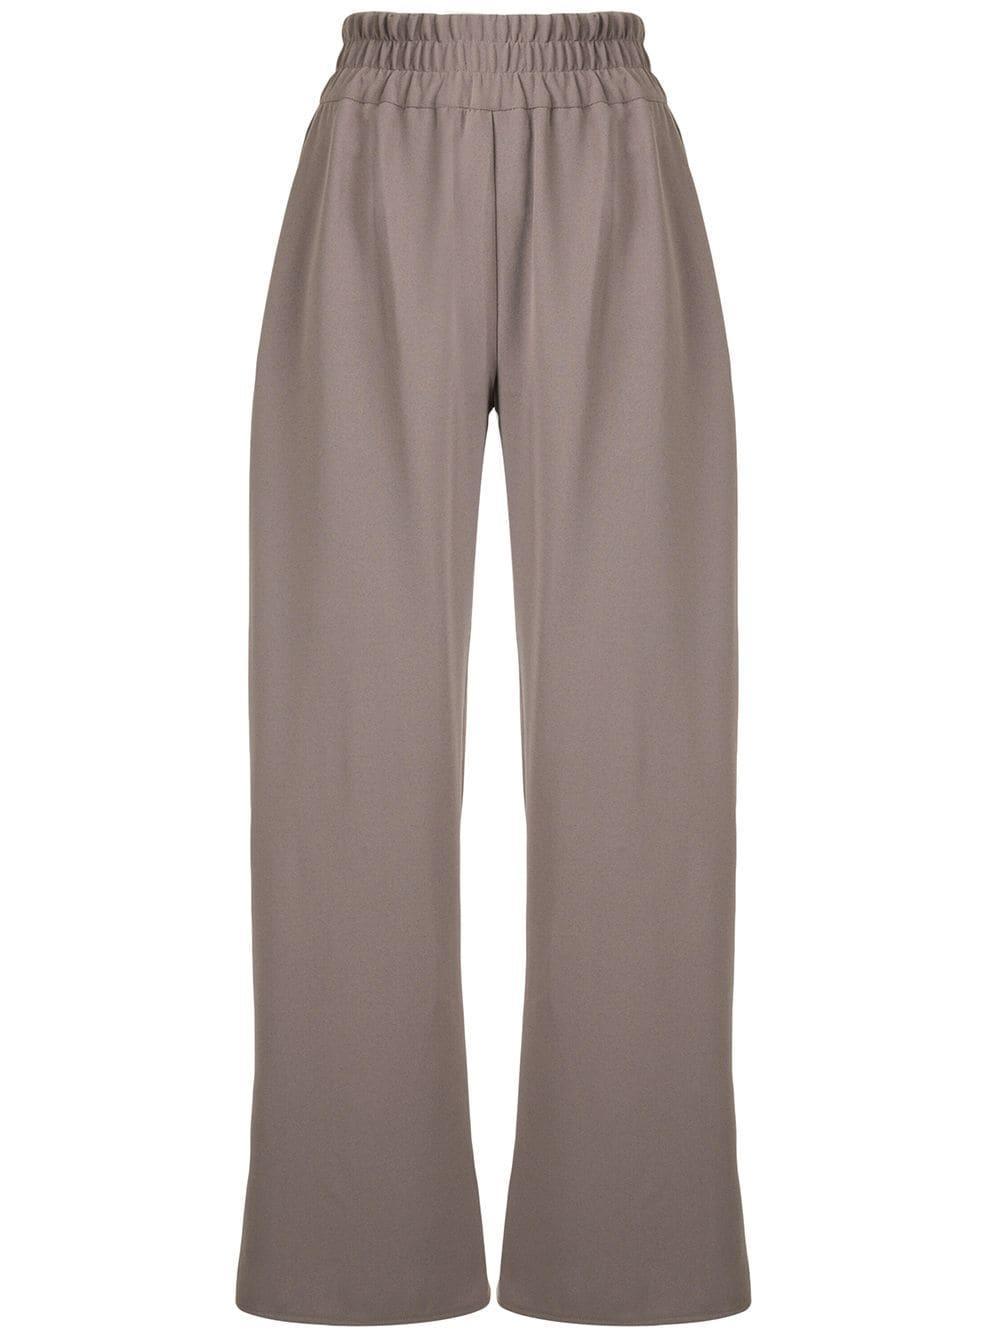 Poula Elastic Wide Leg Pant Item # 1039 10 150 0268